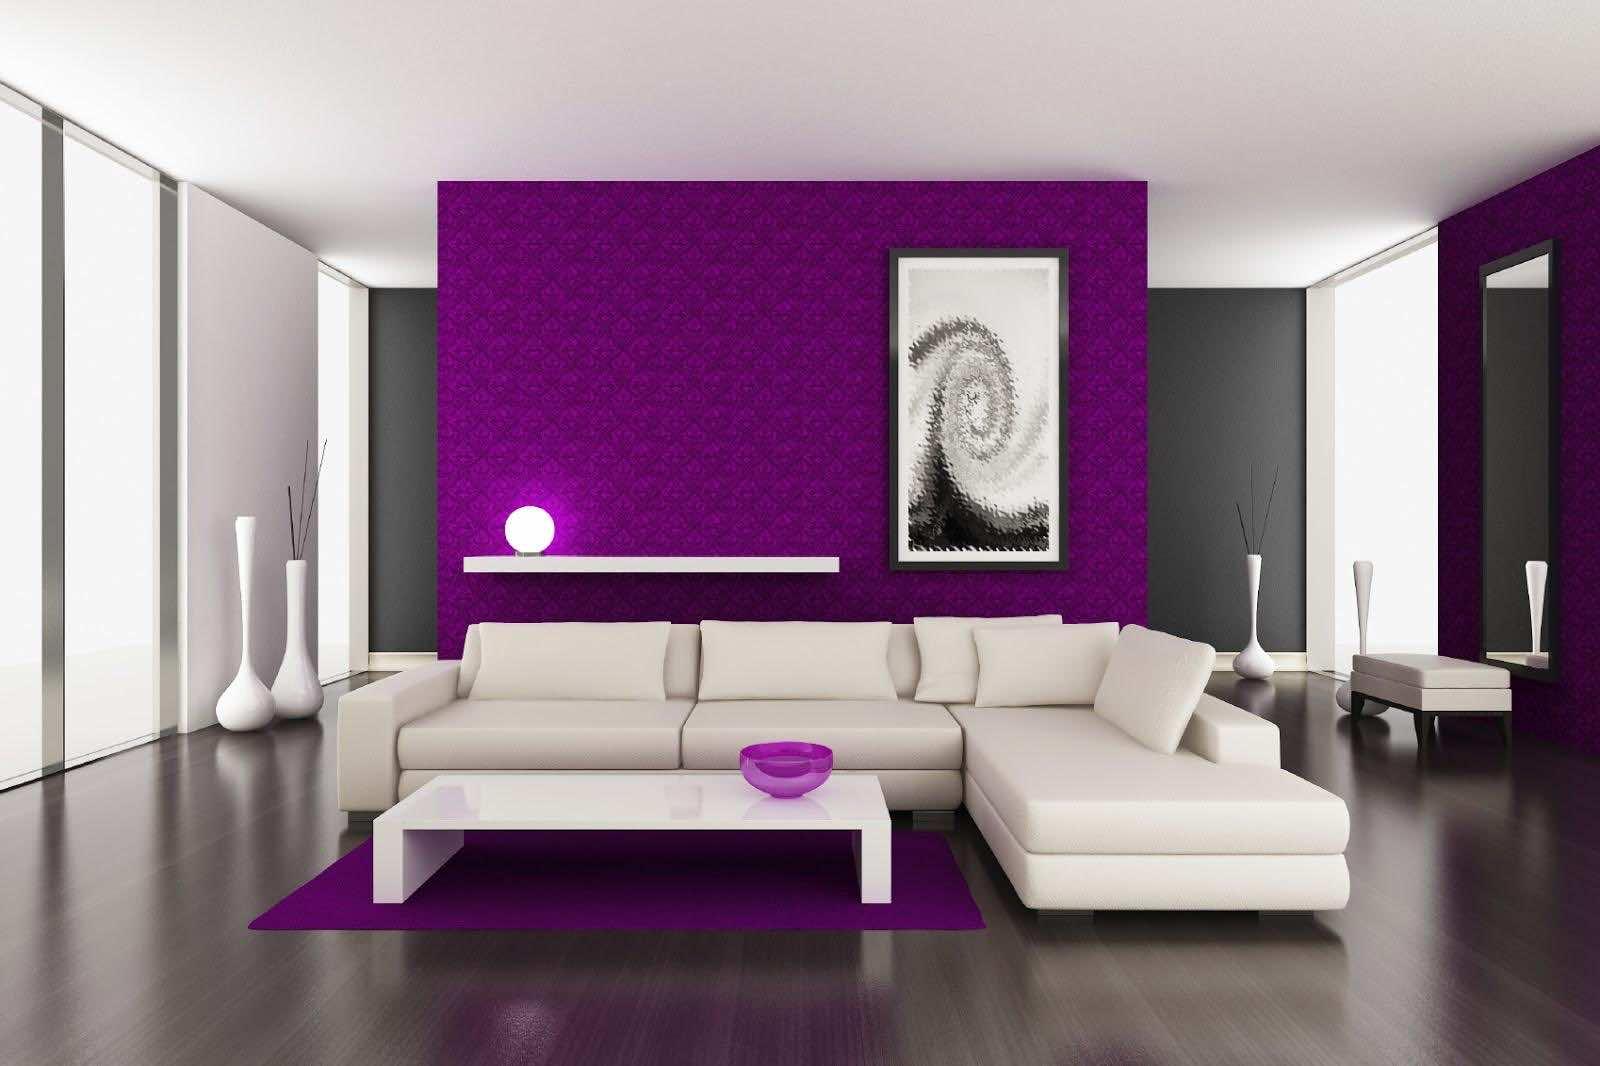 Sensational 25 Paint Color Ideas For Your Home Largest Home Design Picture Inspirations Pitcheantrous